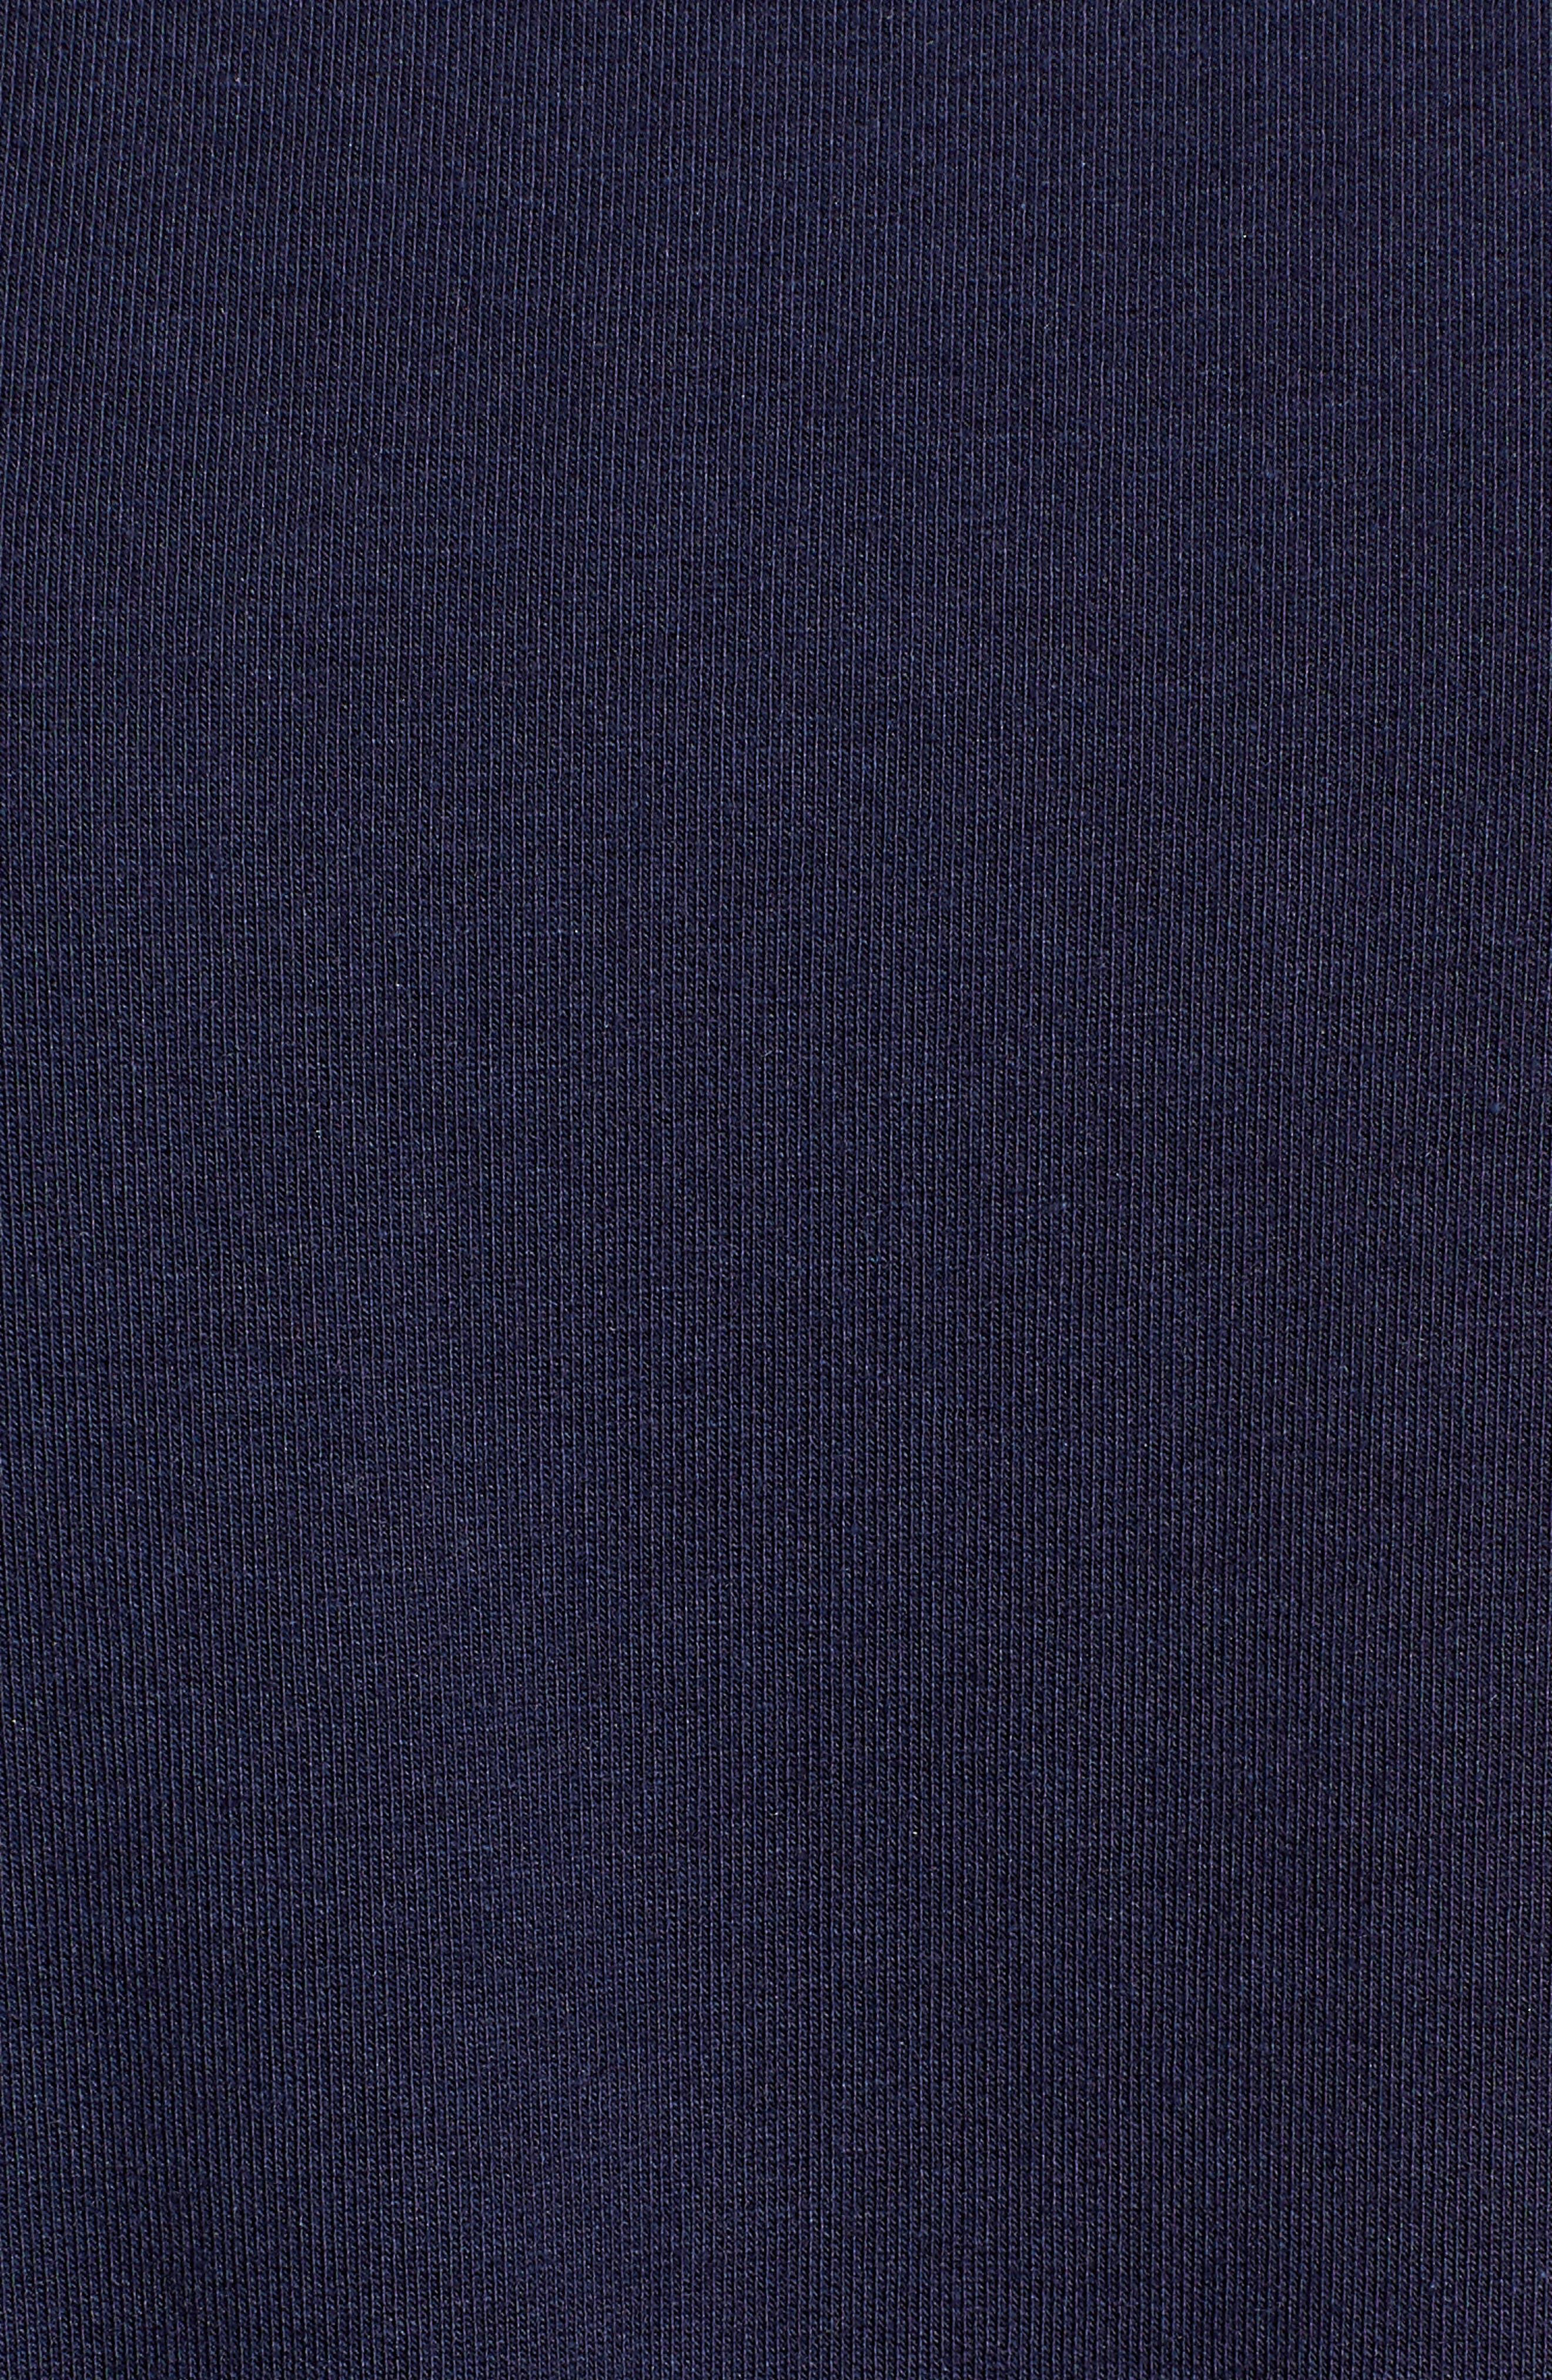 Drawcord Peplum Cotton Blend Top,                             Alternate thumbnail 6, color,                             Navy Peacoat